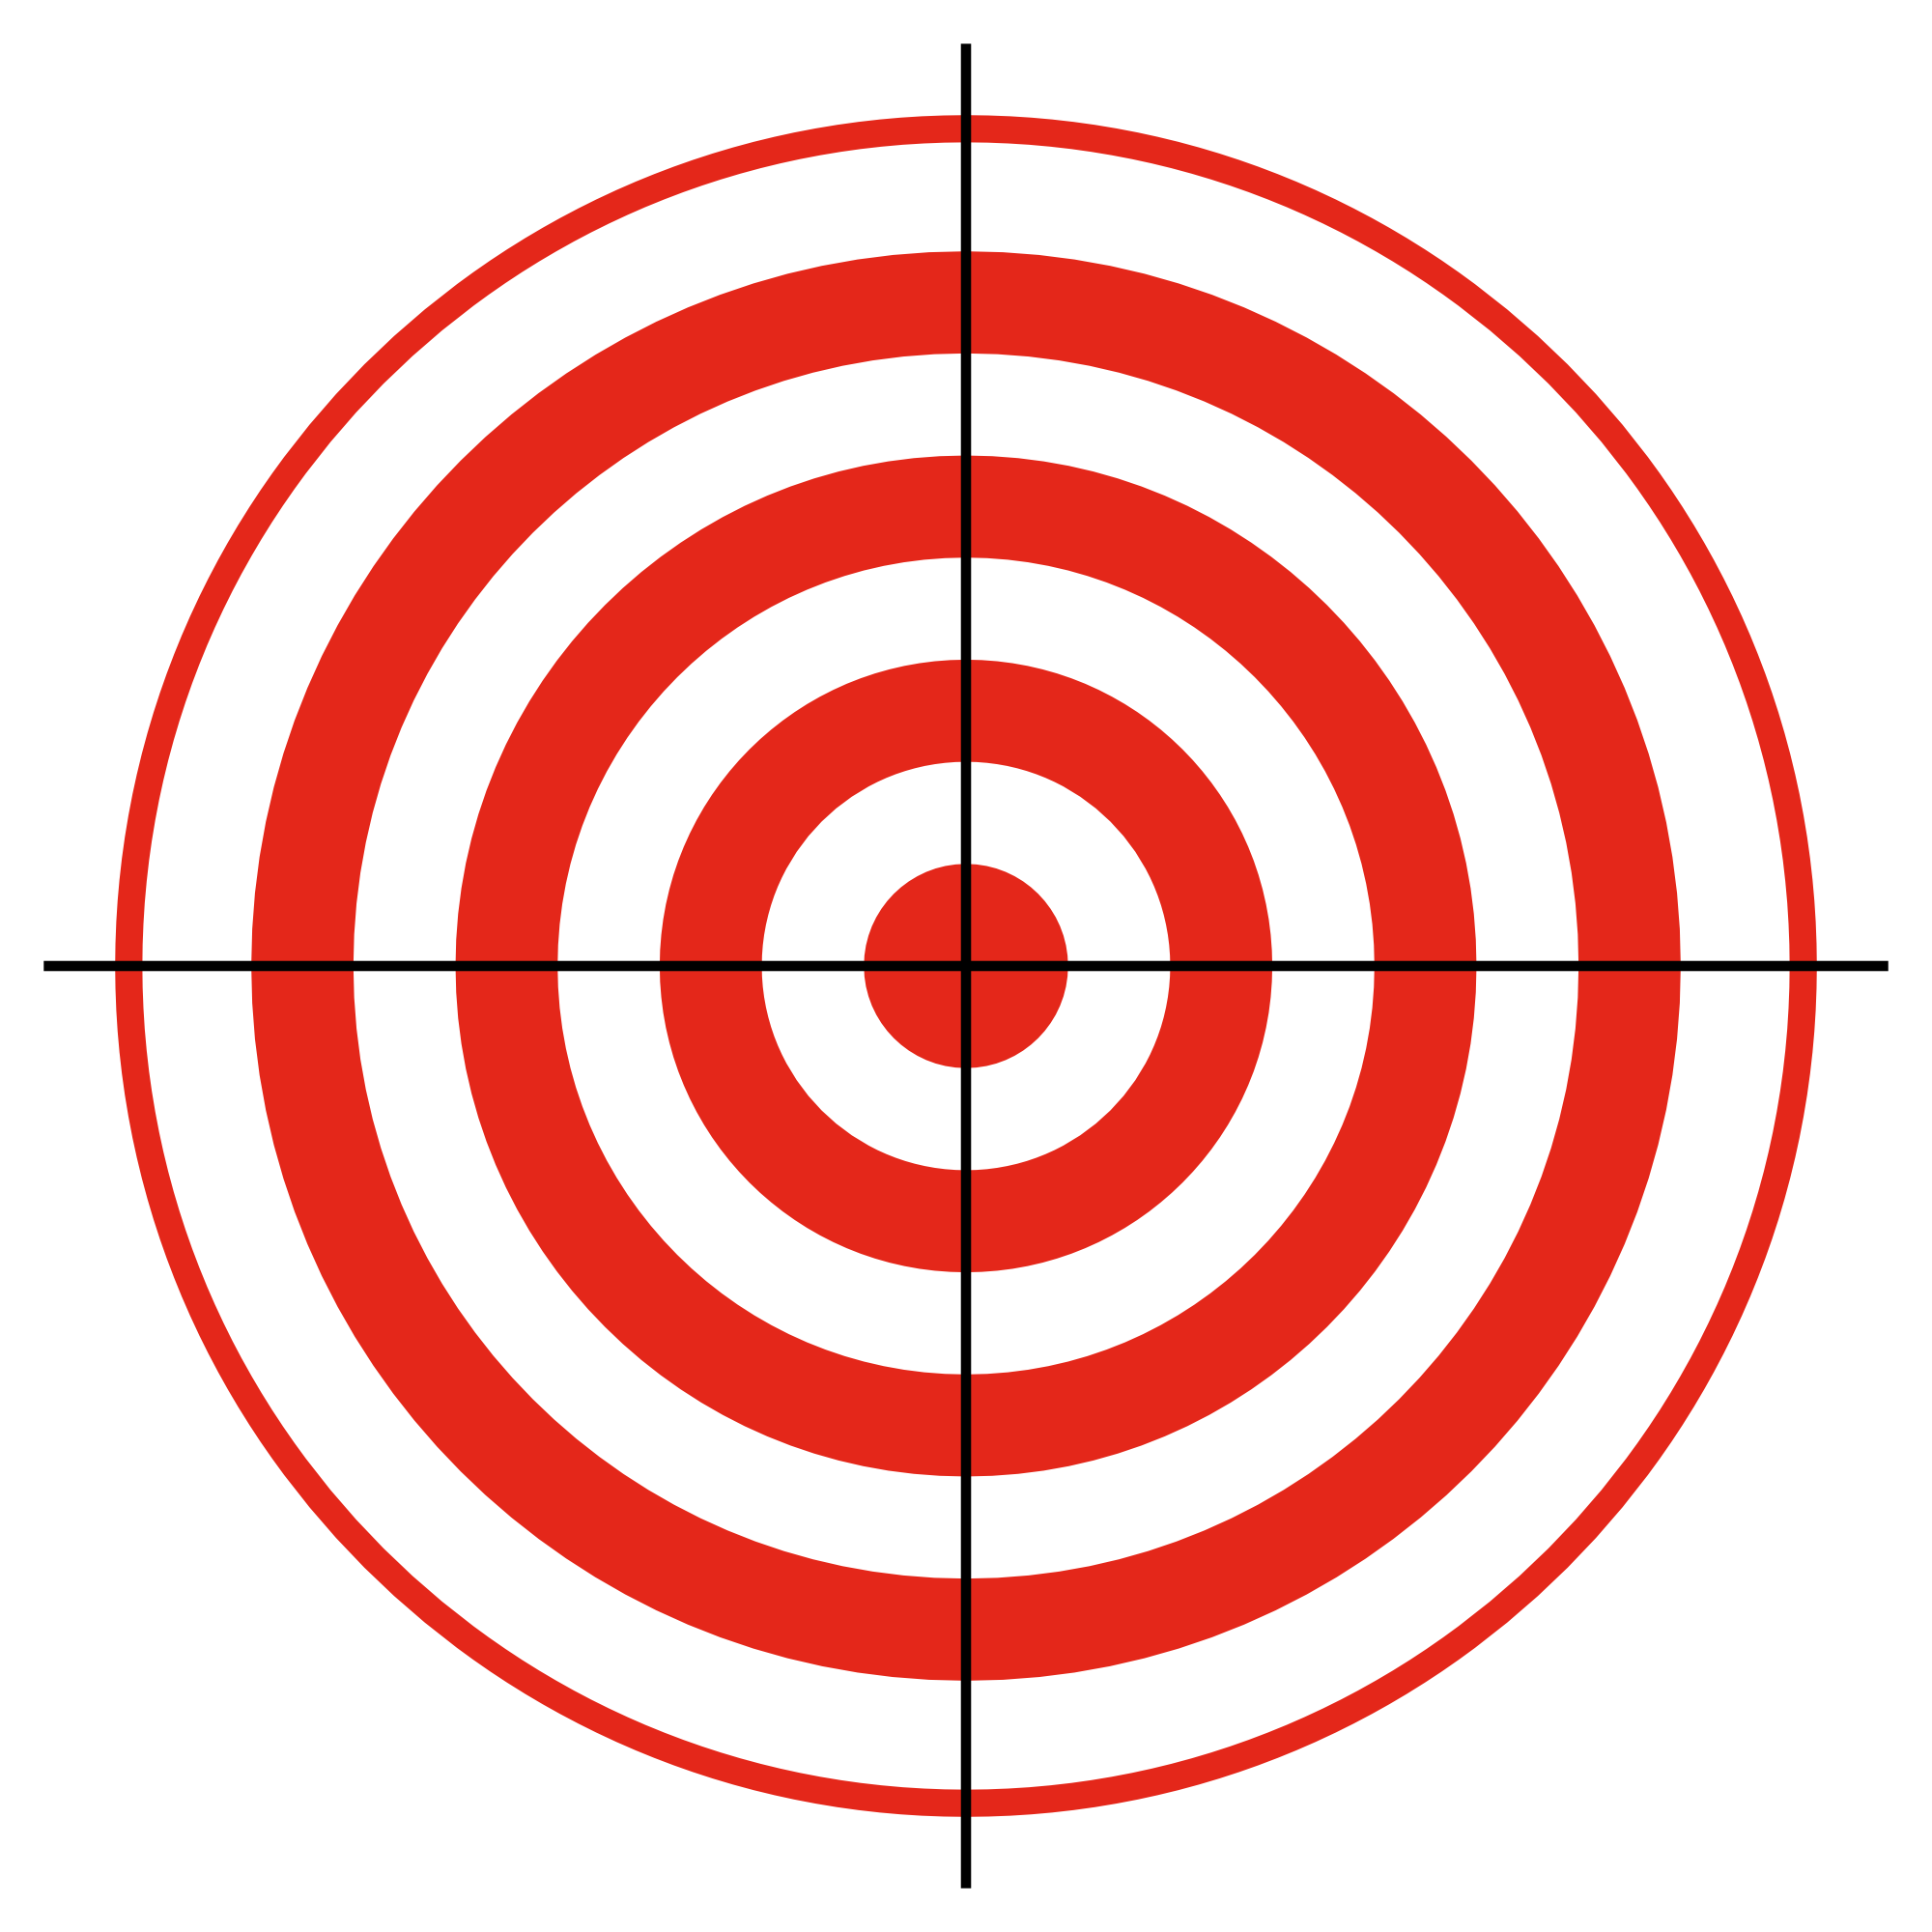 Aim Png - Target, Transparent background PNG HD thumbnail